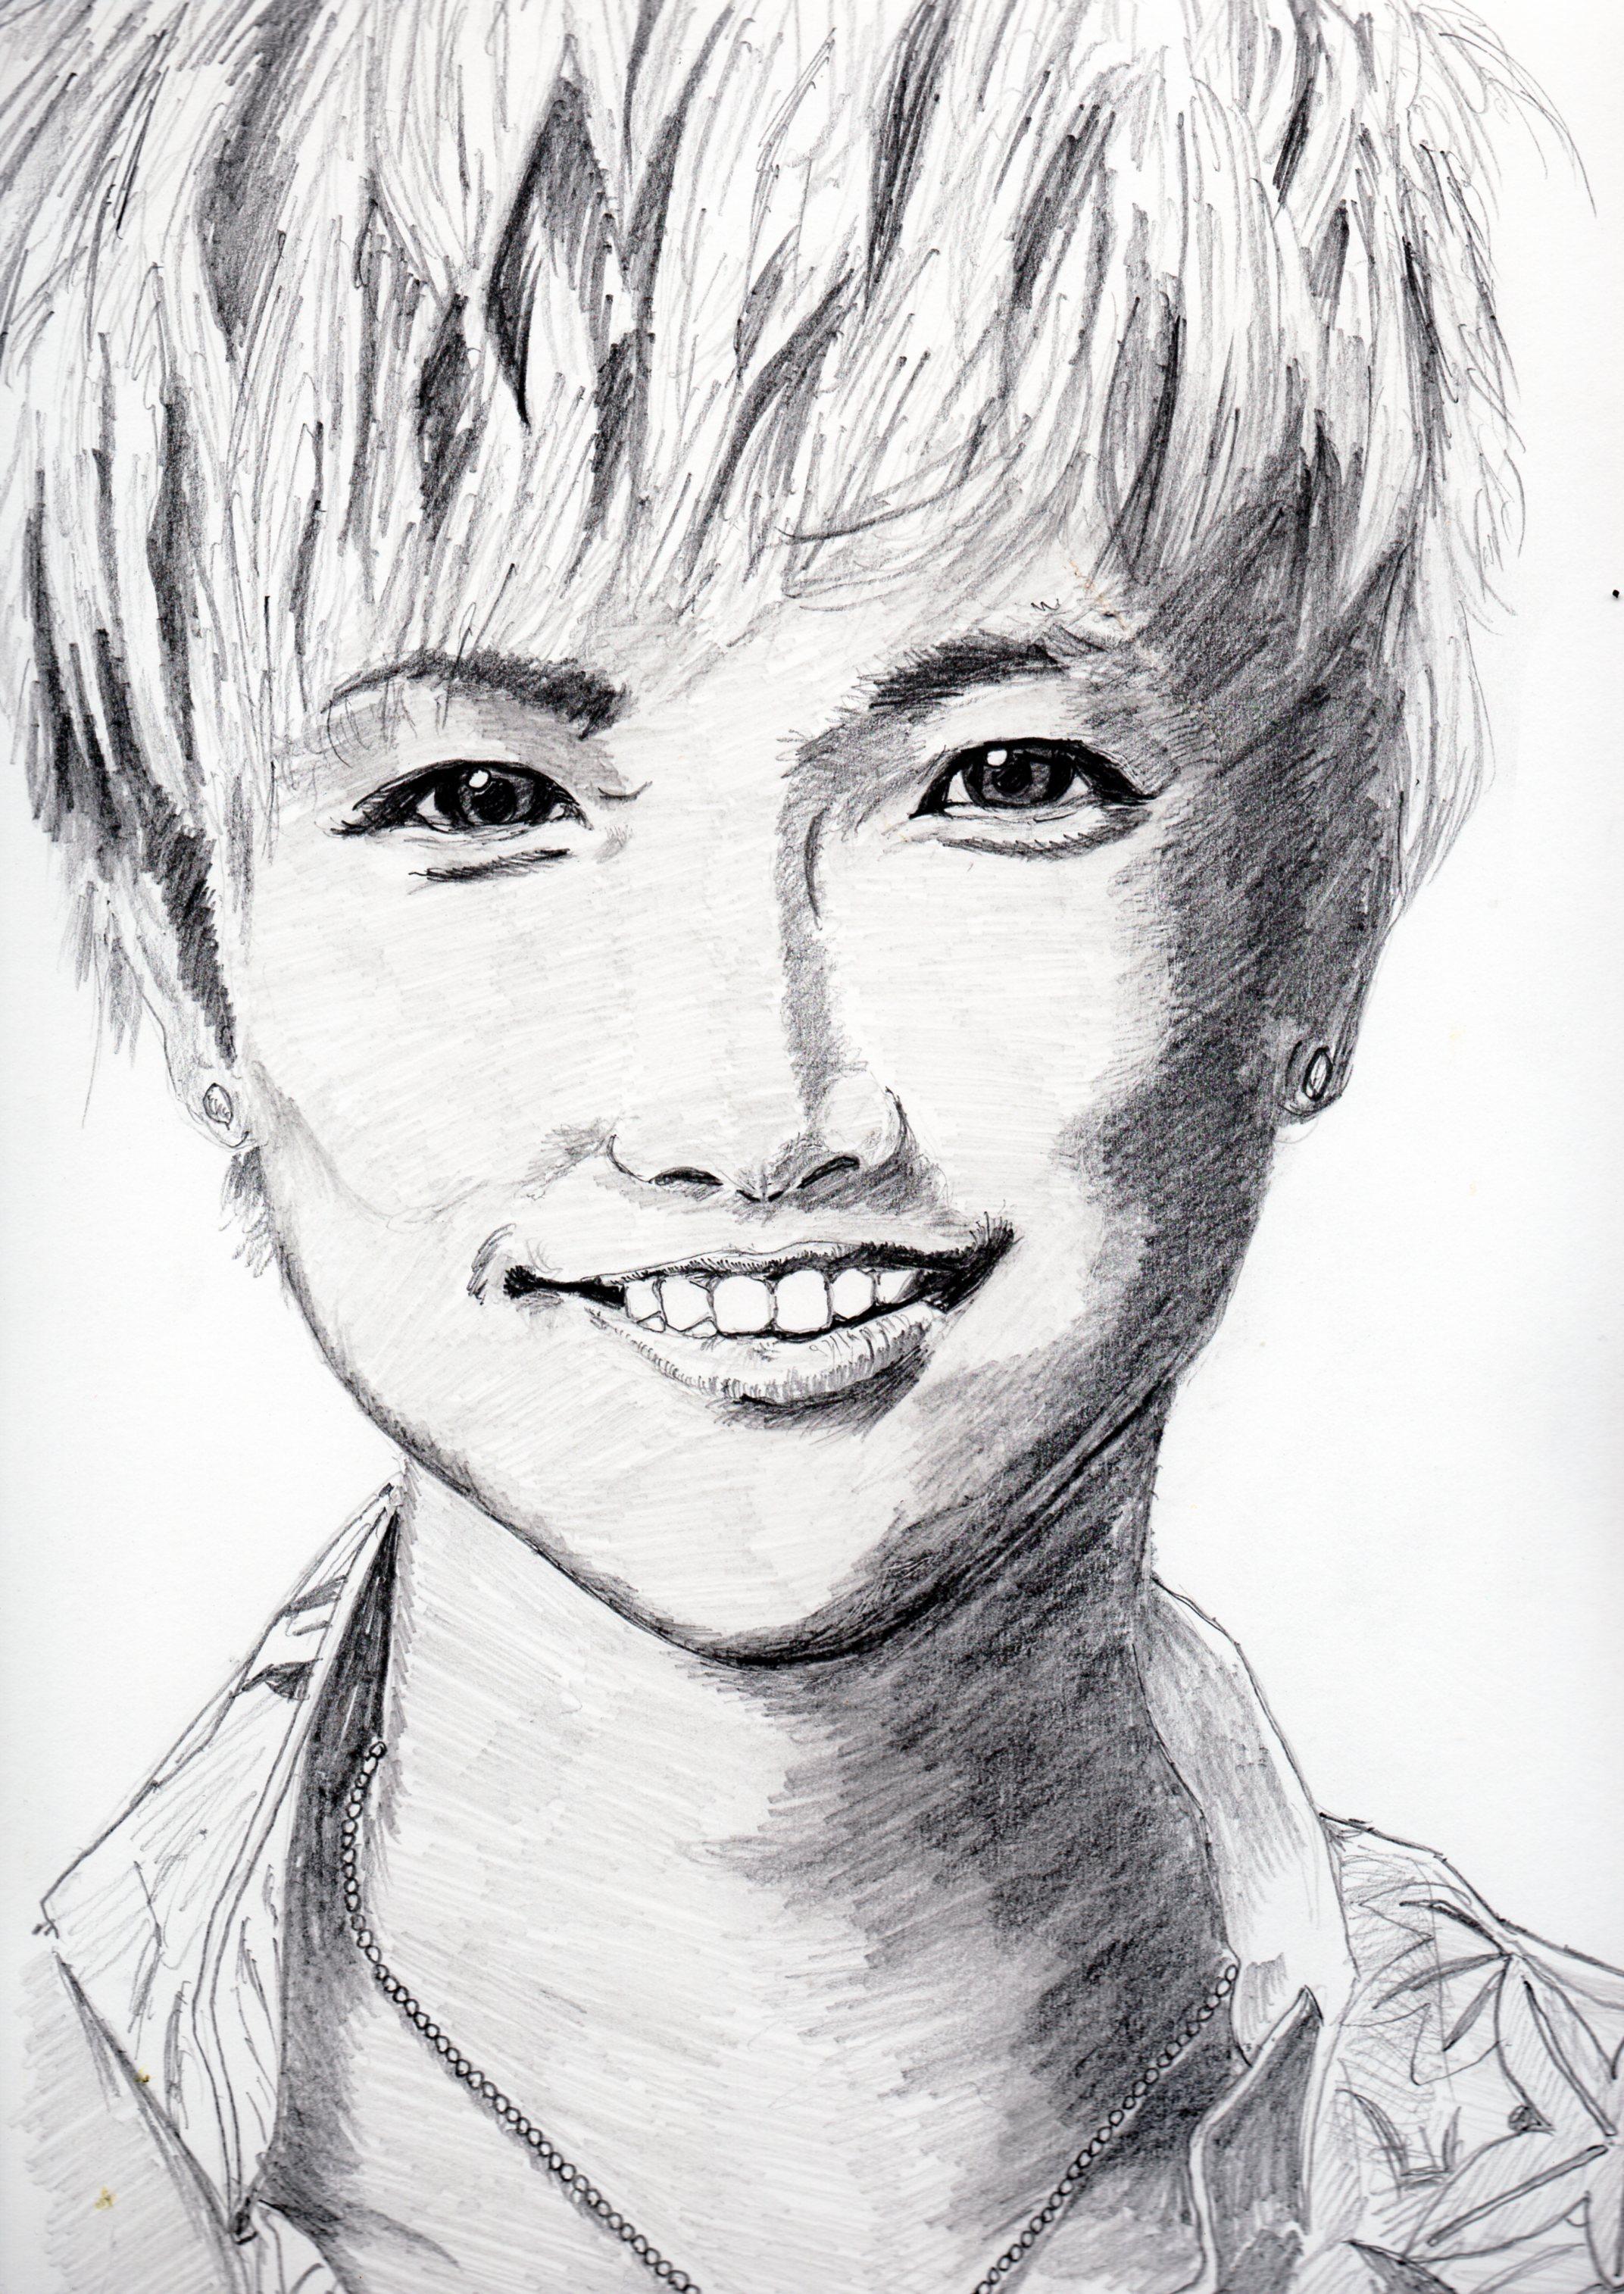 岩田剛典の鉛筆画似顔絵